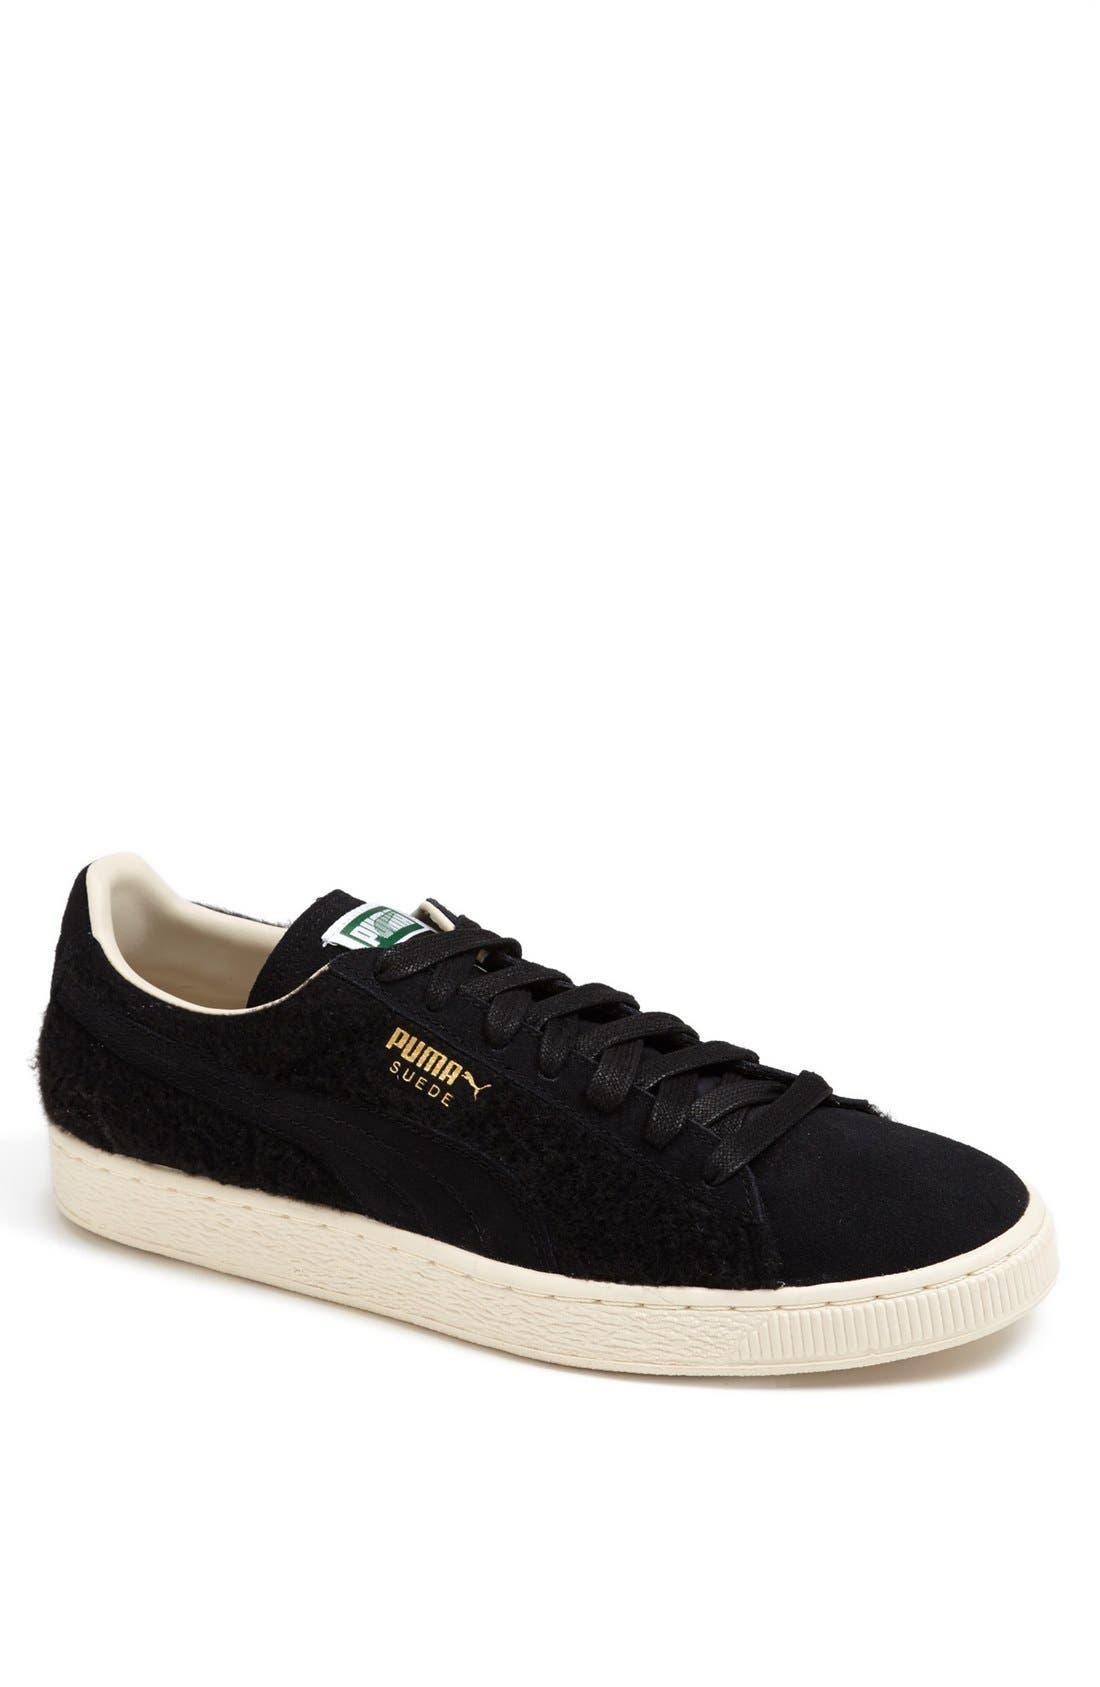 'Suede City' Sneaker,                             Main thumbnail 1, color,                             001